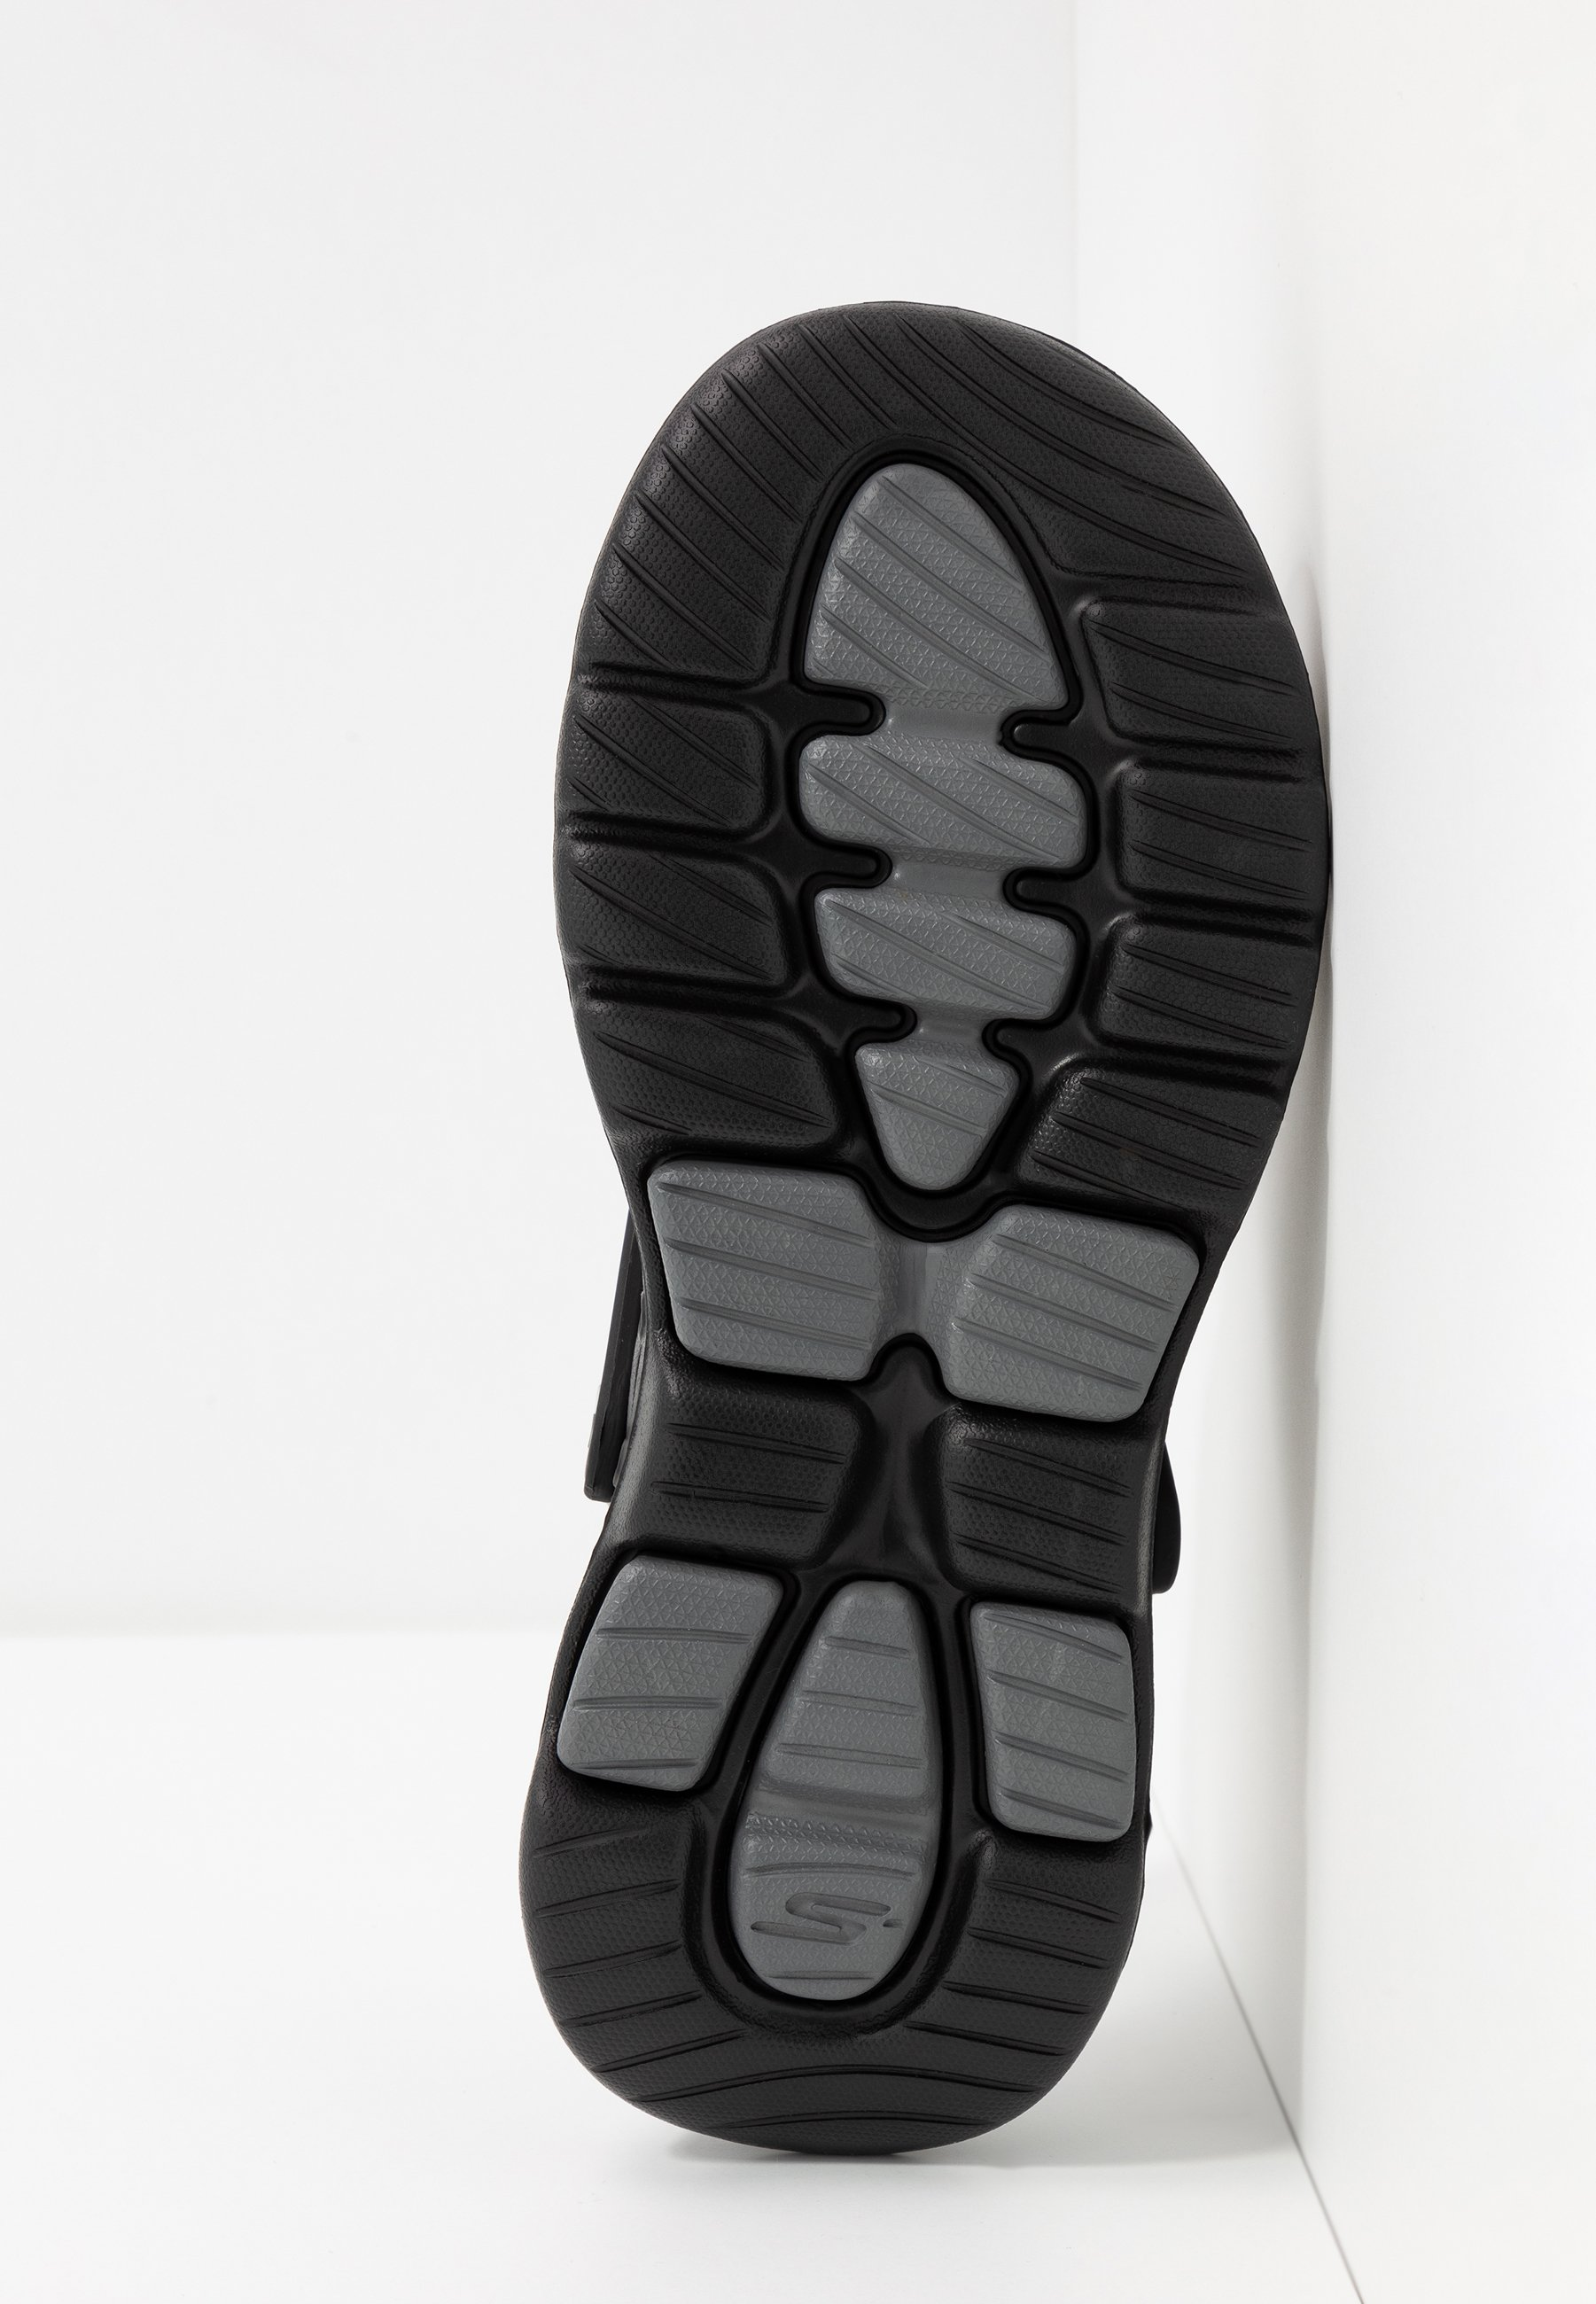 Recomendar Barato Calzado de hombre Skechers Performance GO WALK 5 Chanclas de baño black/charcoal arsljC